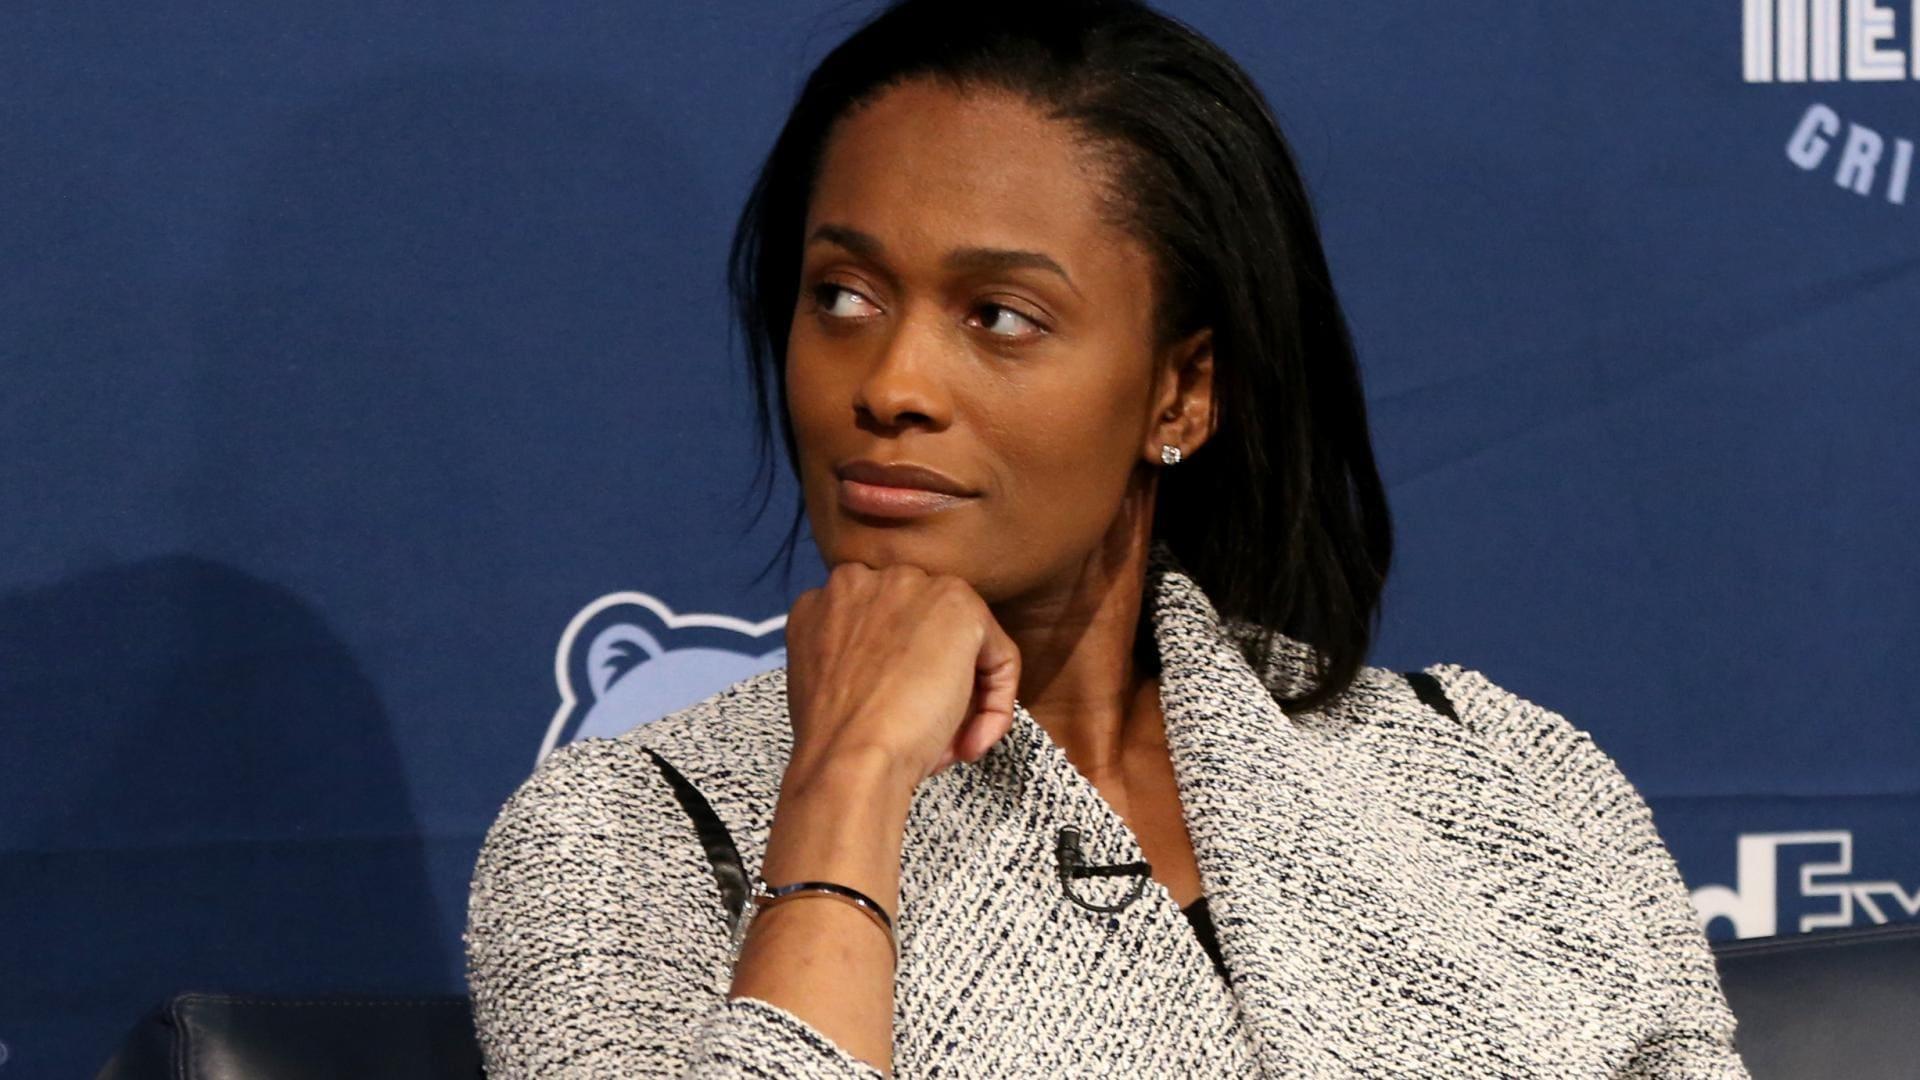 Pelicans add Swin Cash as senior executive